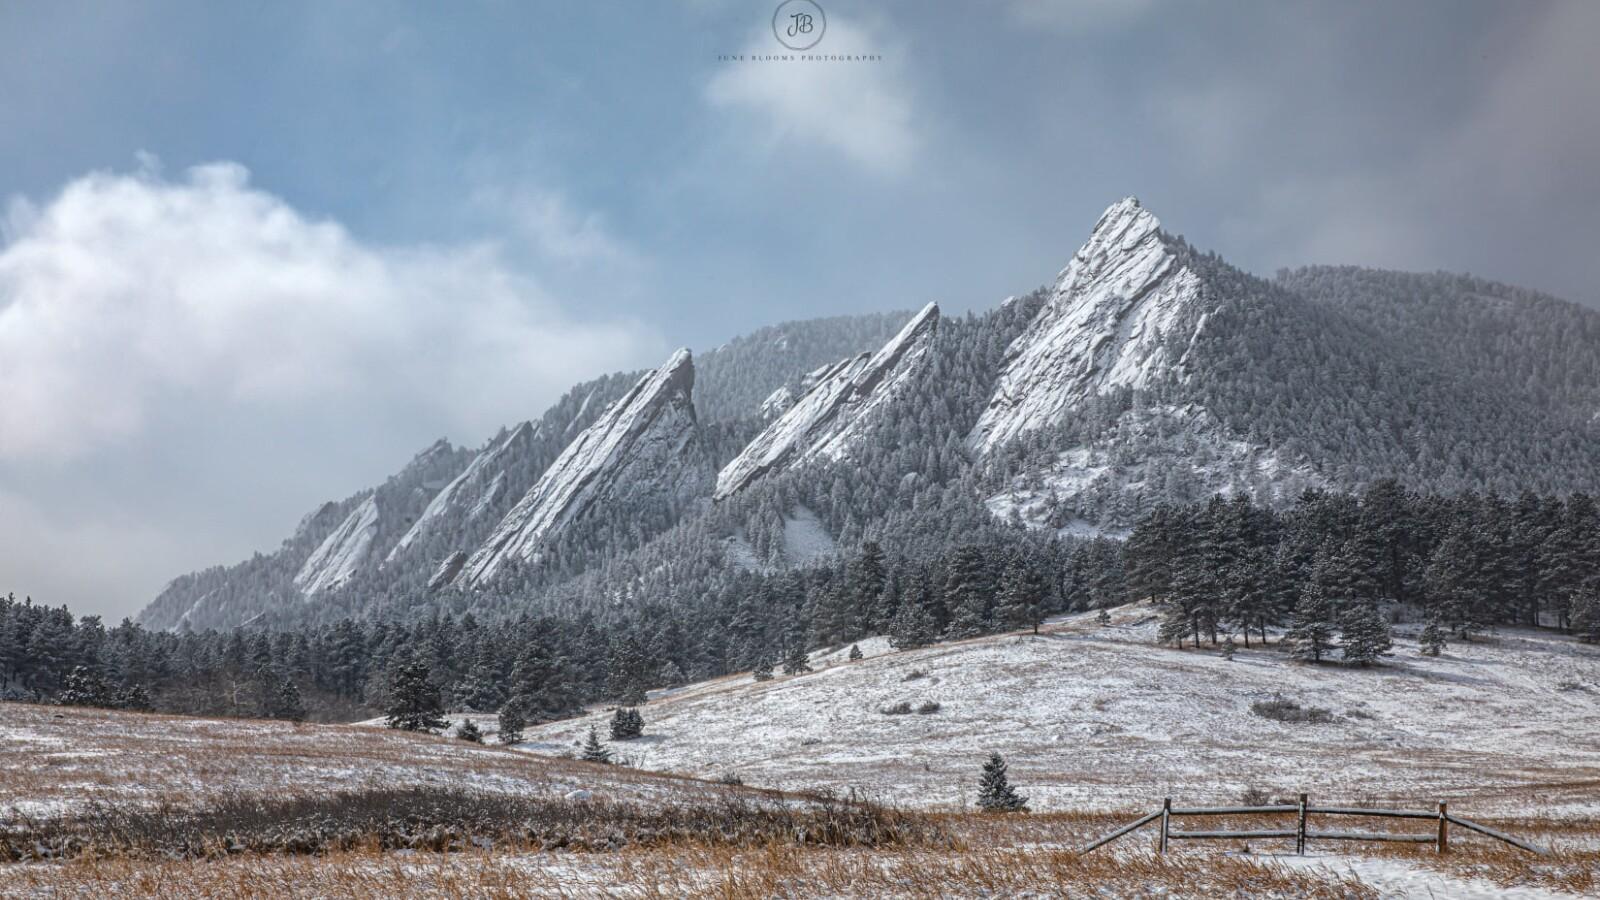 Boulder Flatirons June Blooms Photography.jpg